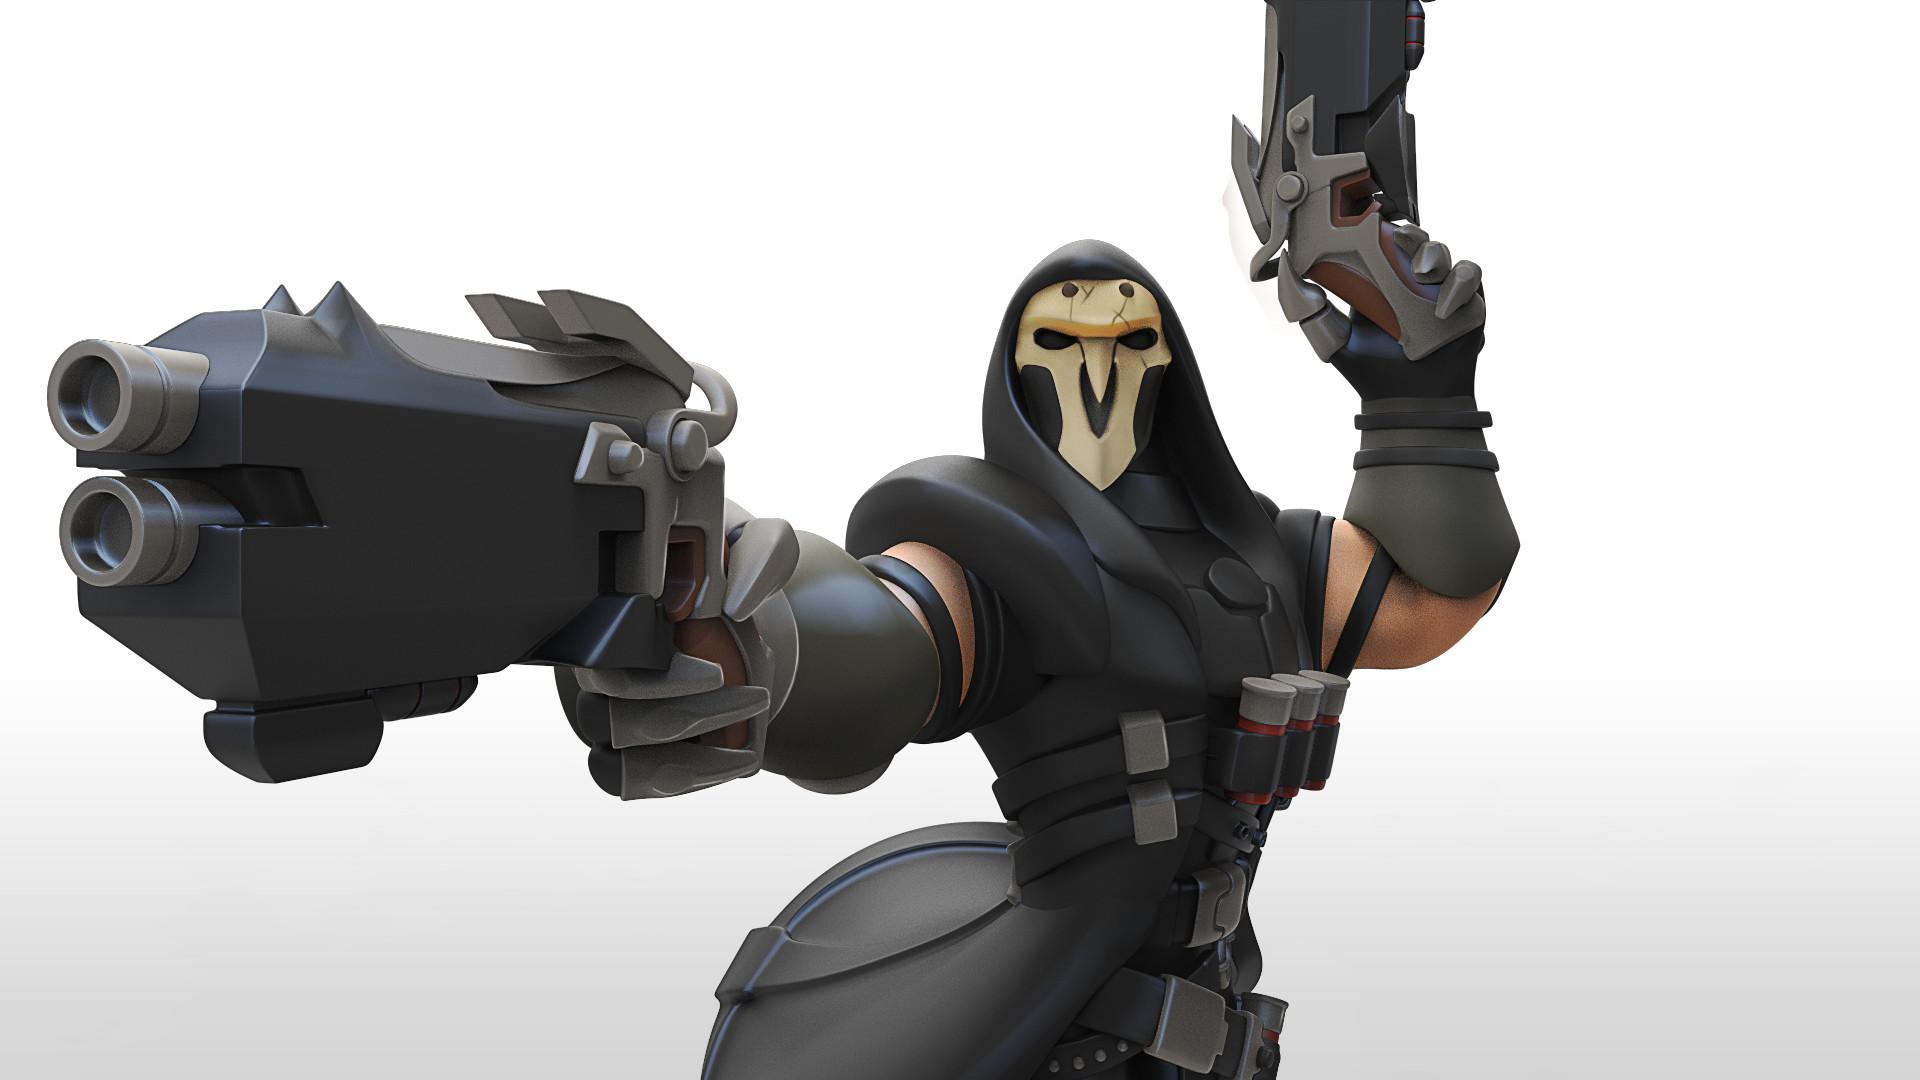 ArtStation - Reaper Overwatch Infinity    and beyond!, Marko